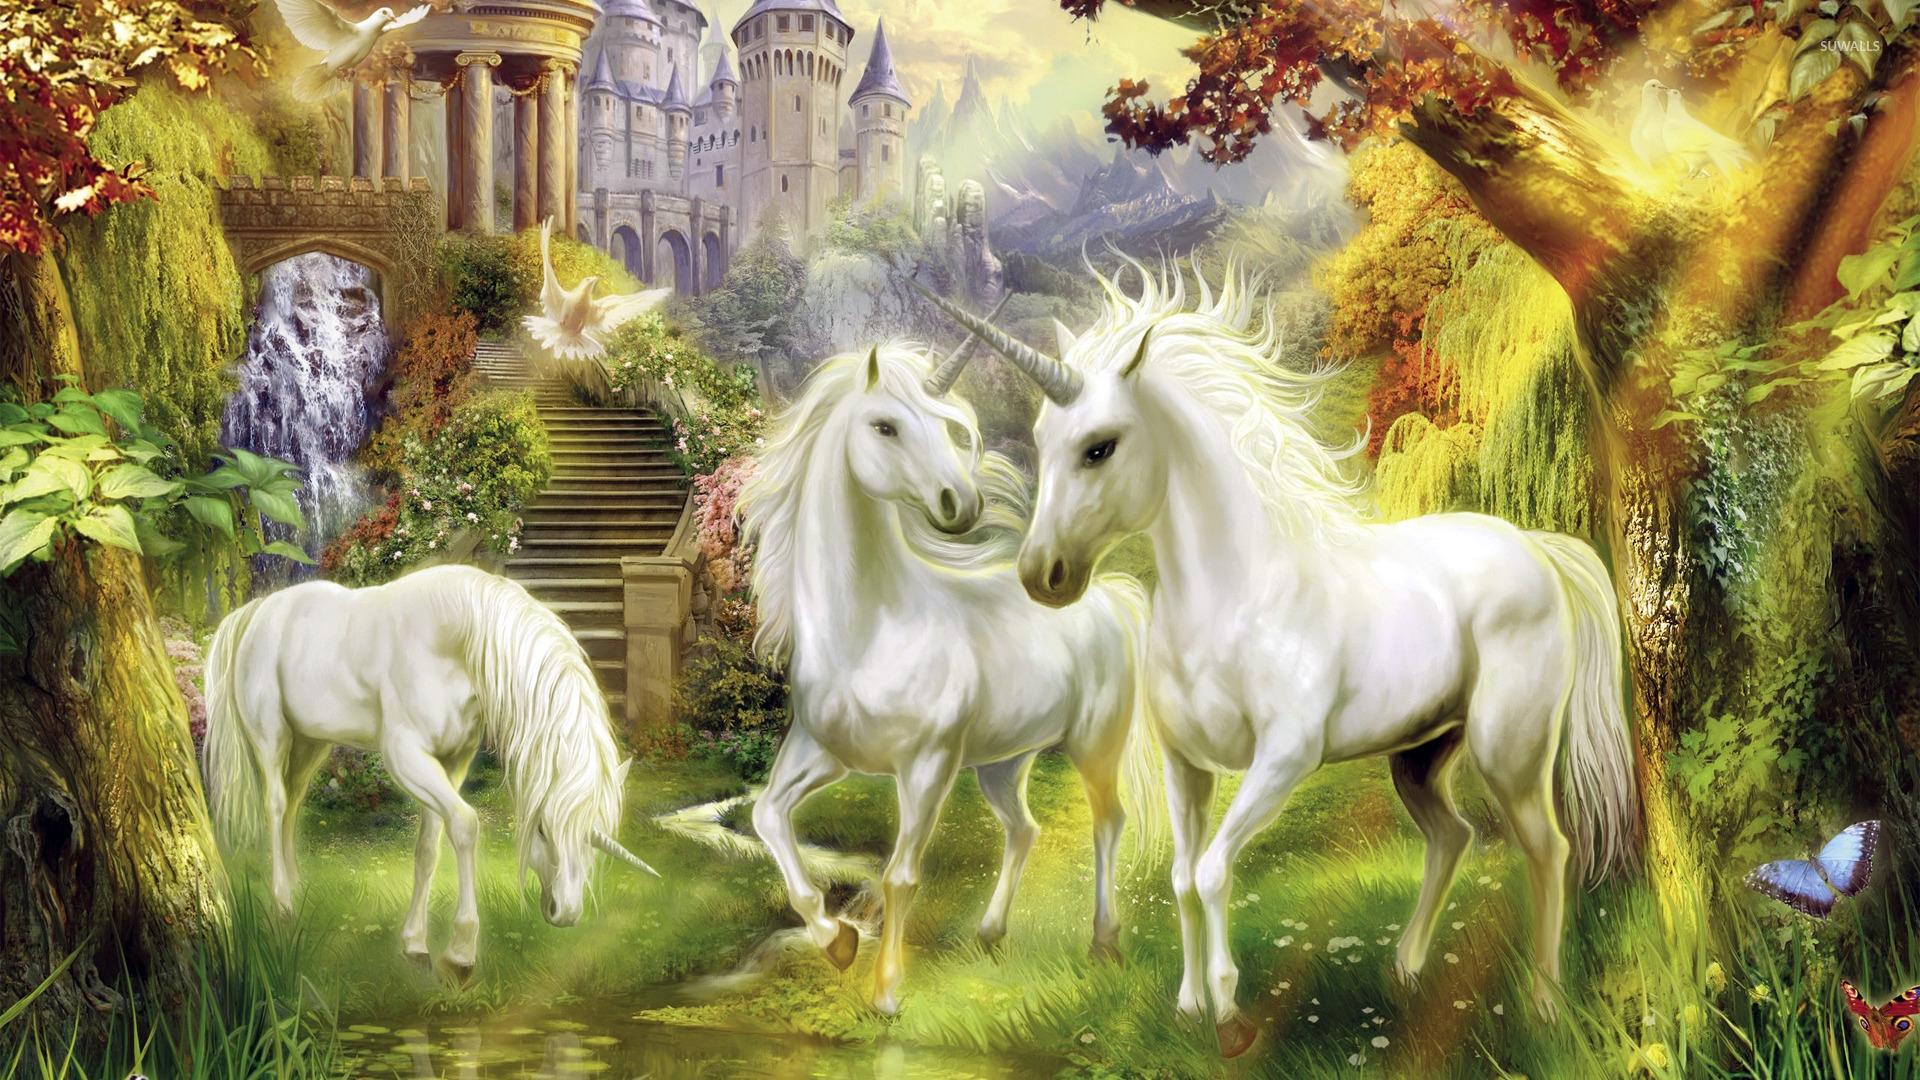 Unicorns in the castle garden wallpaper   Fantasy wallpapers   22059 1920x1080